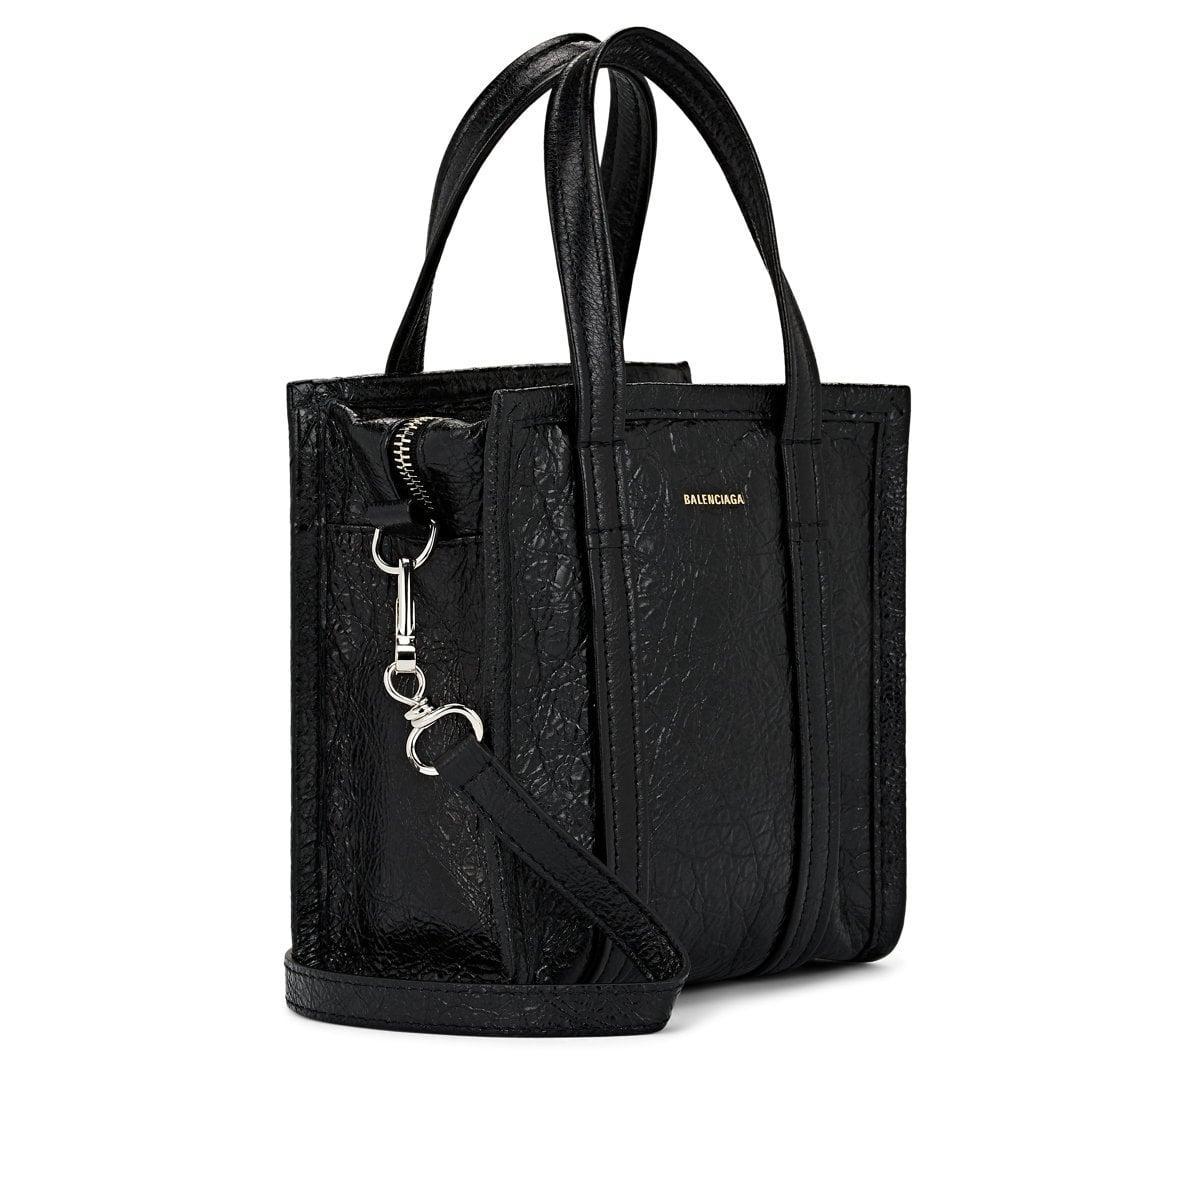 ac0f99f854 Balenciaga - Black Arena Leather Bazar Extra-extra-small Shopper Tote -  Lyst. View fullscreen